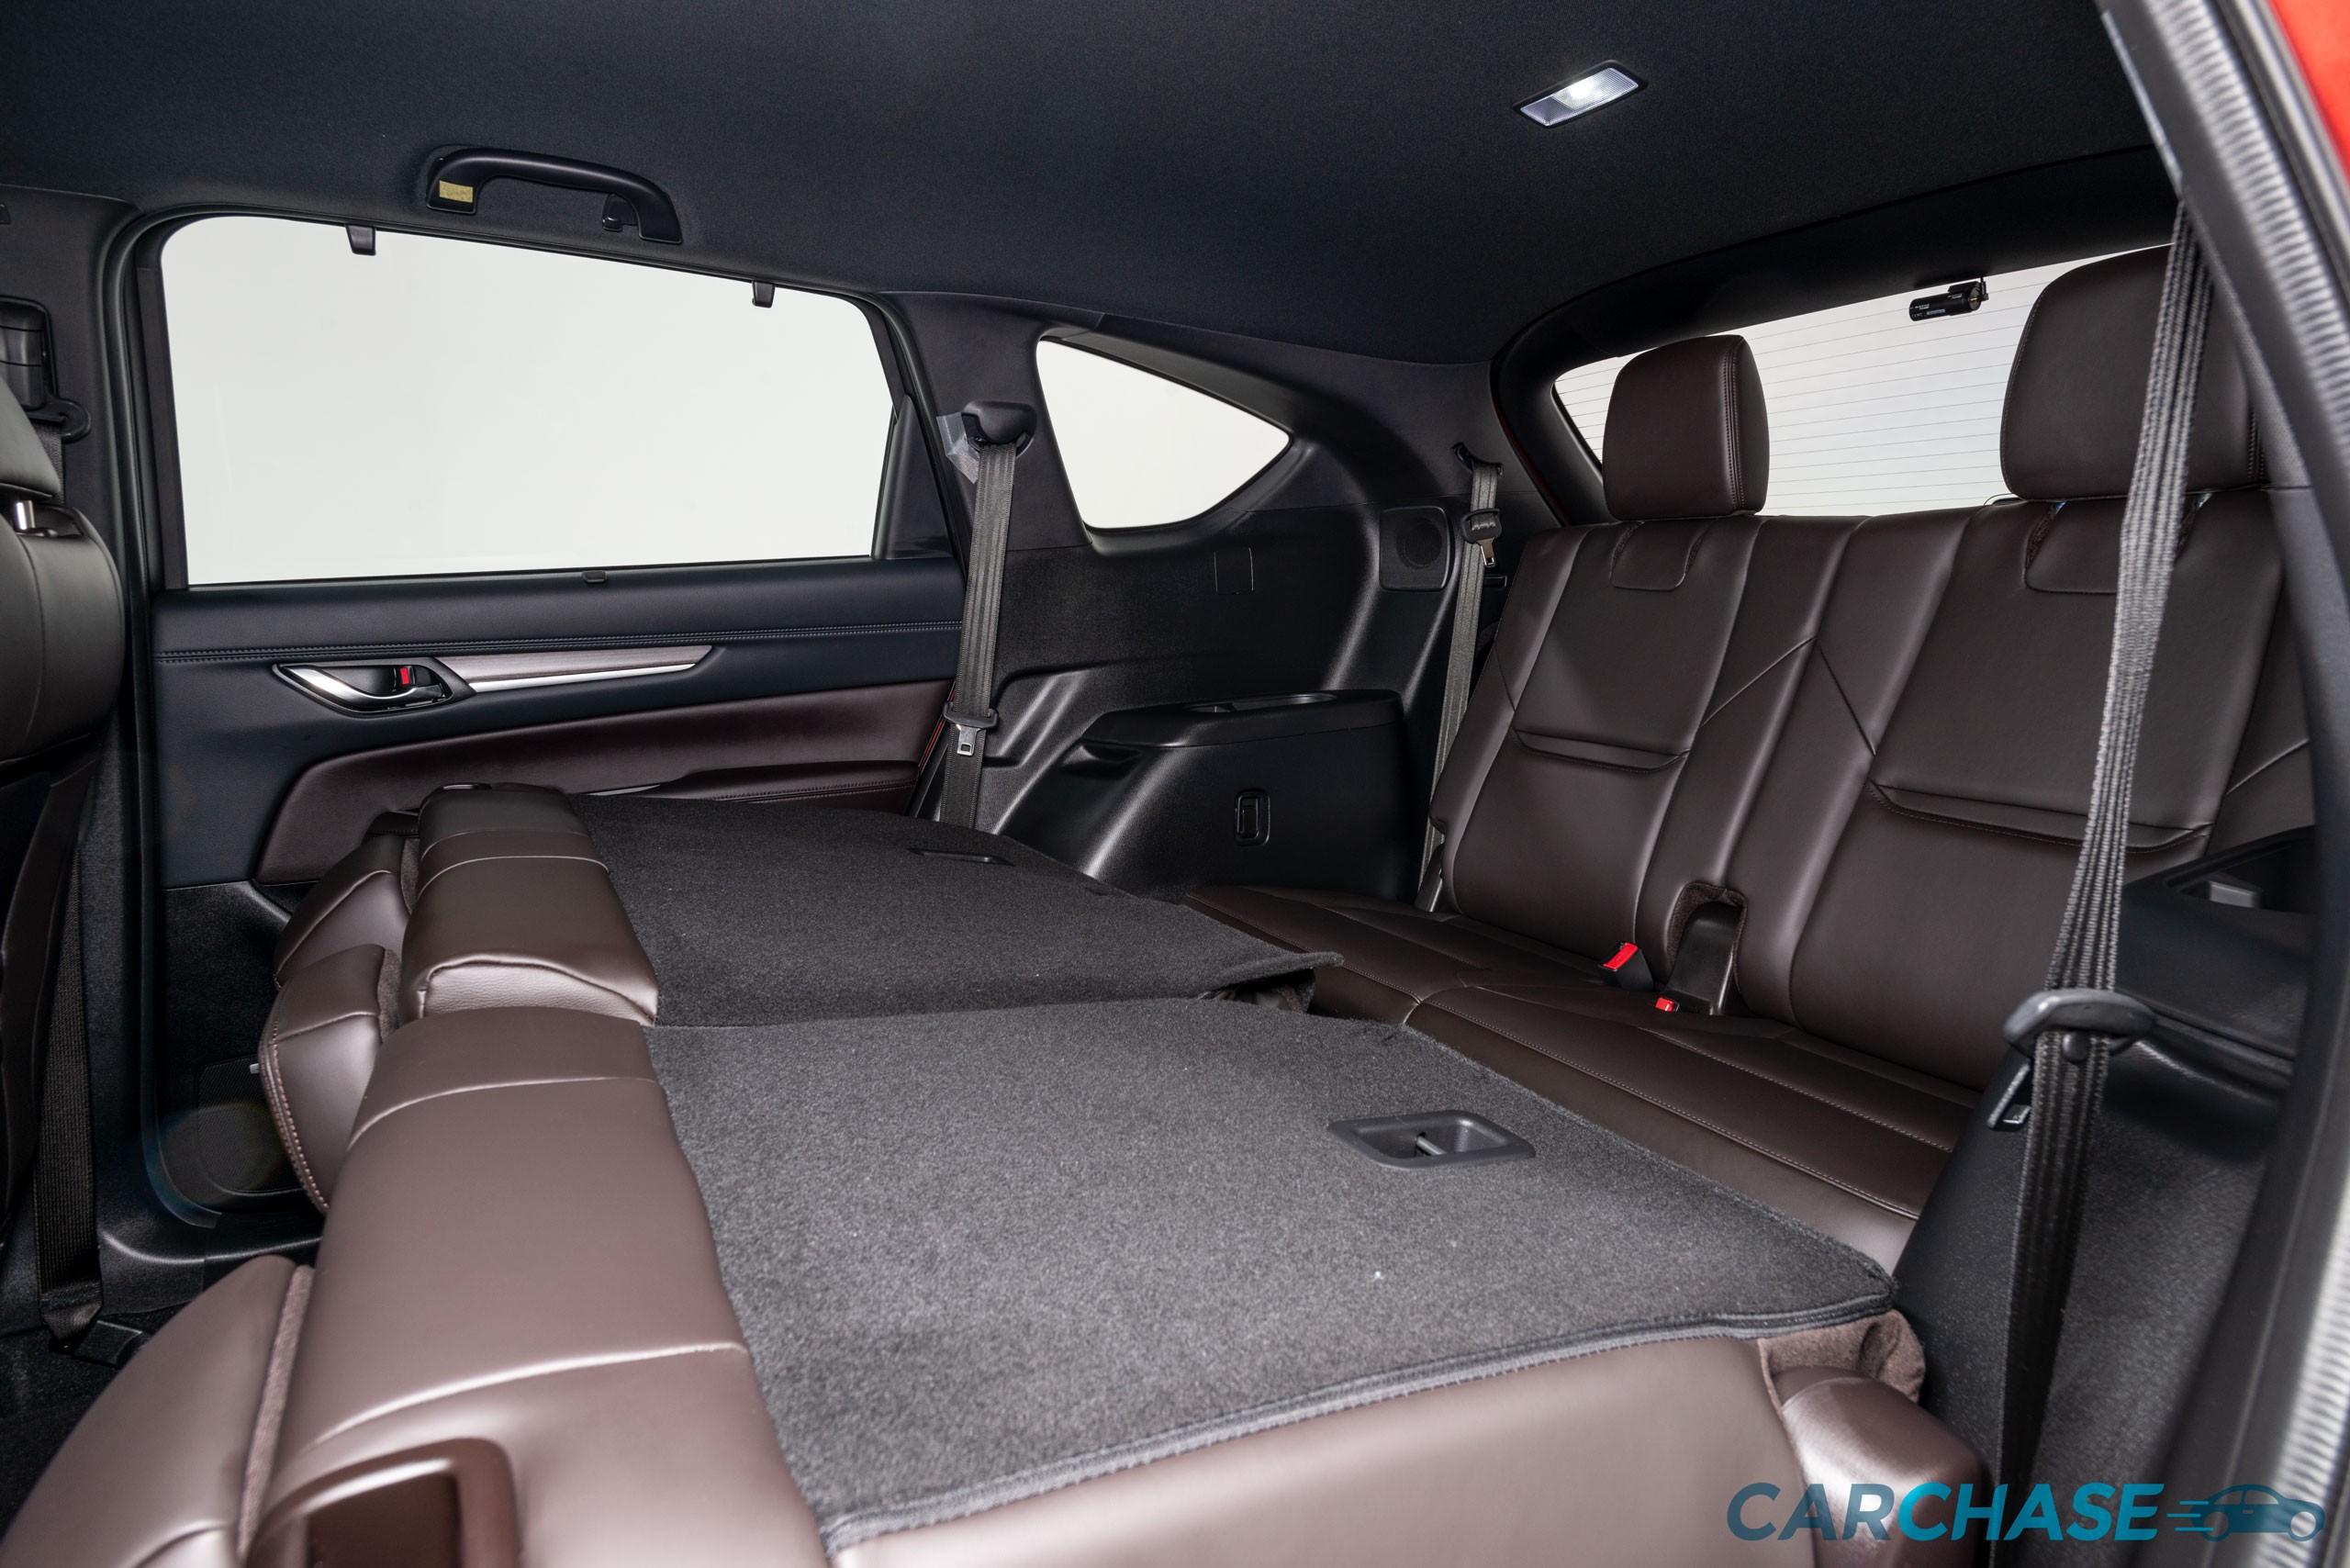 Image of passenger rear 2 profile of 2018 Mazda CX-8 Asaki